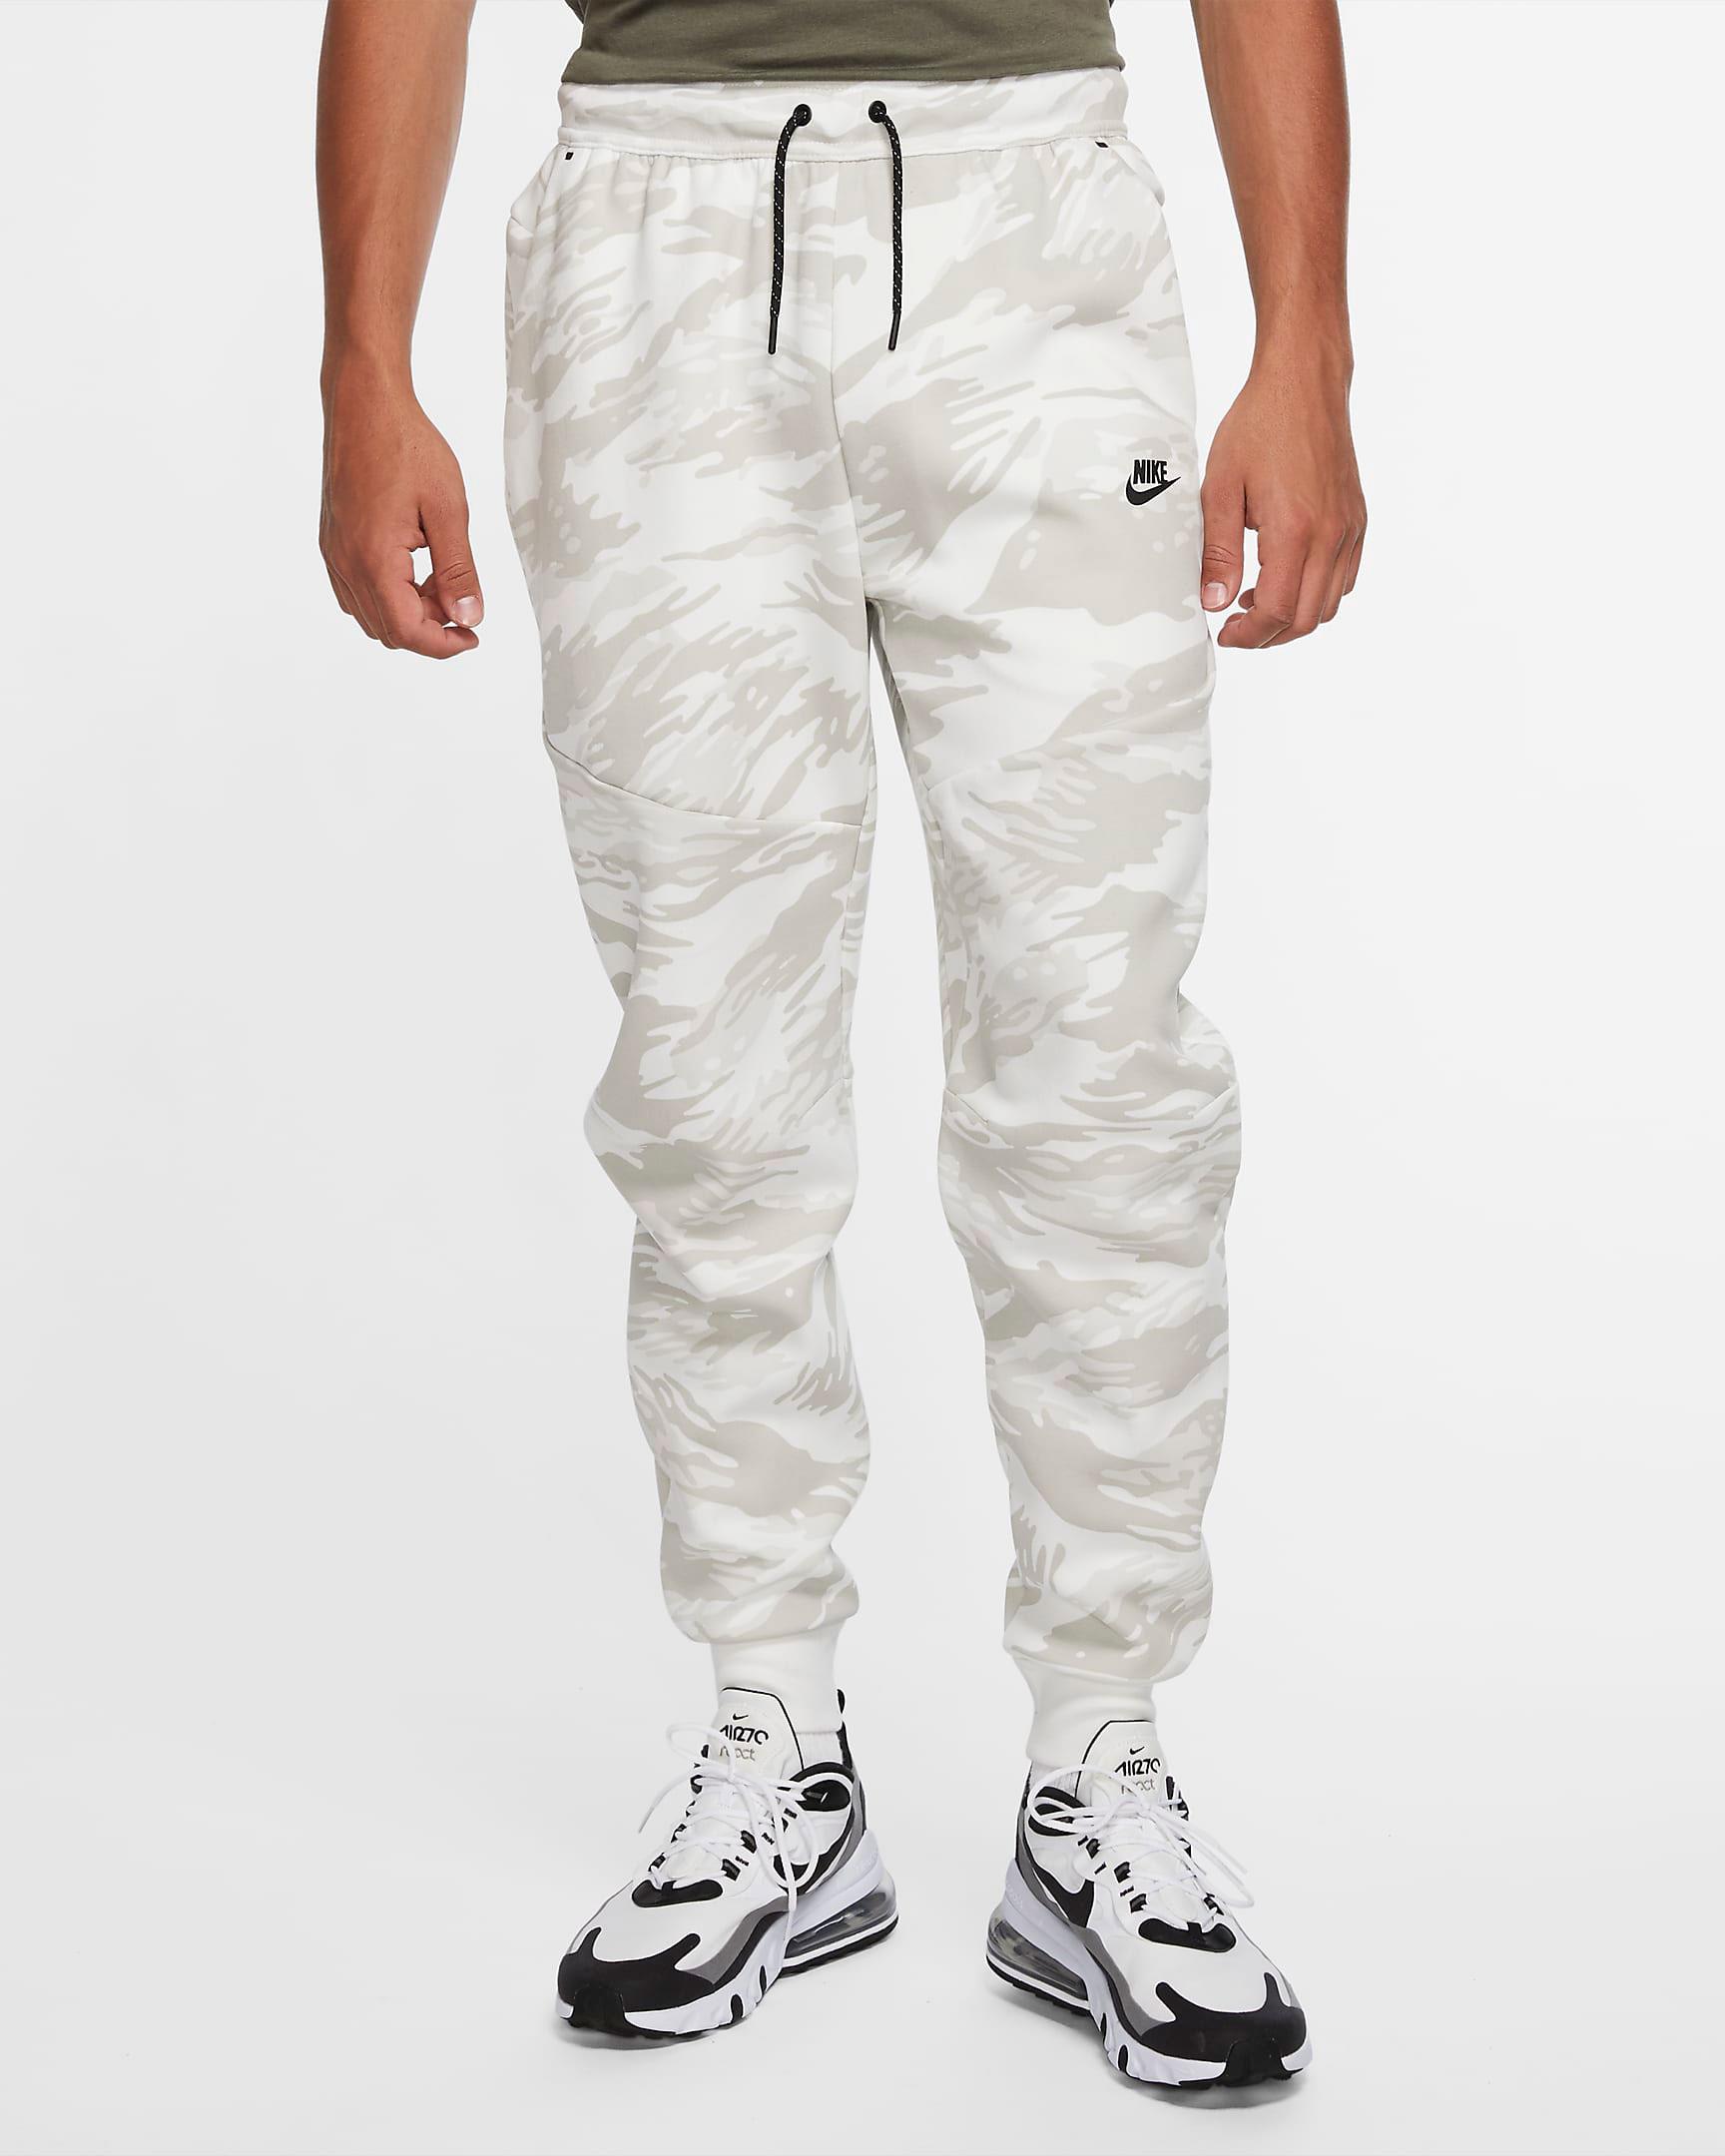 off-white-air-jordan-5-sail-nike-jogger-pants-1